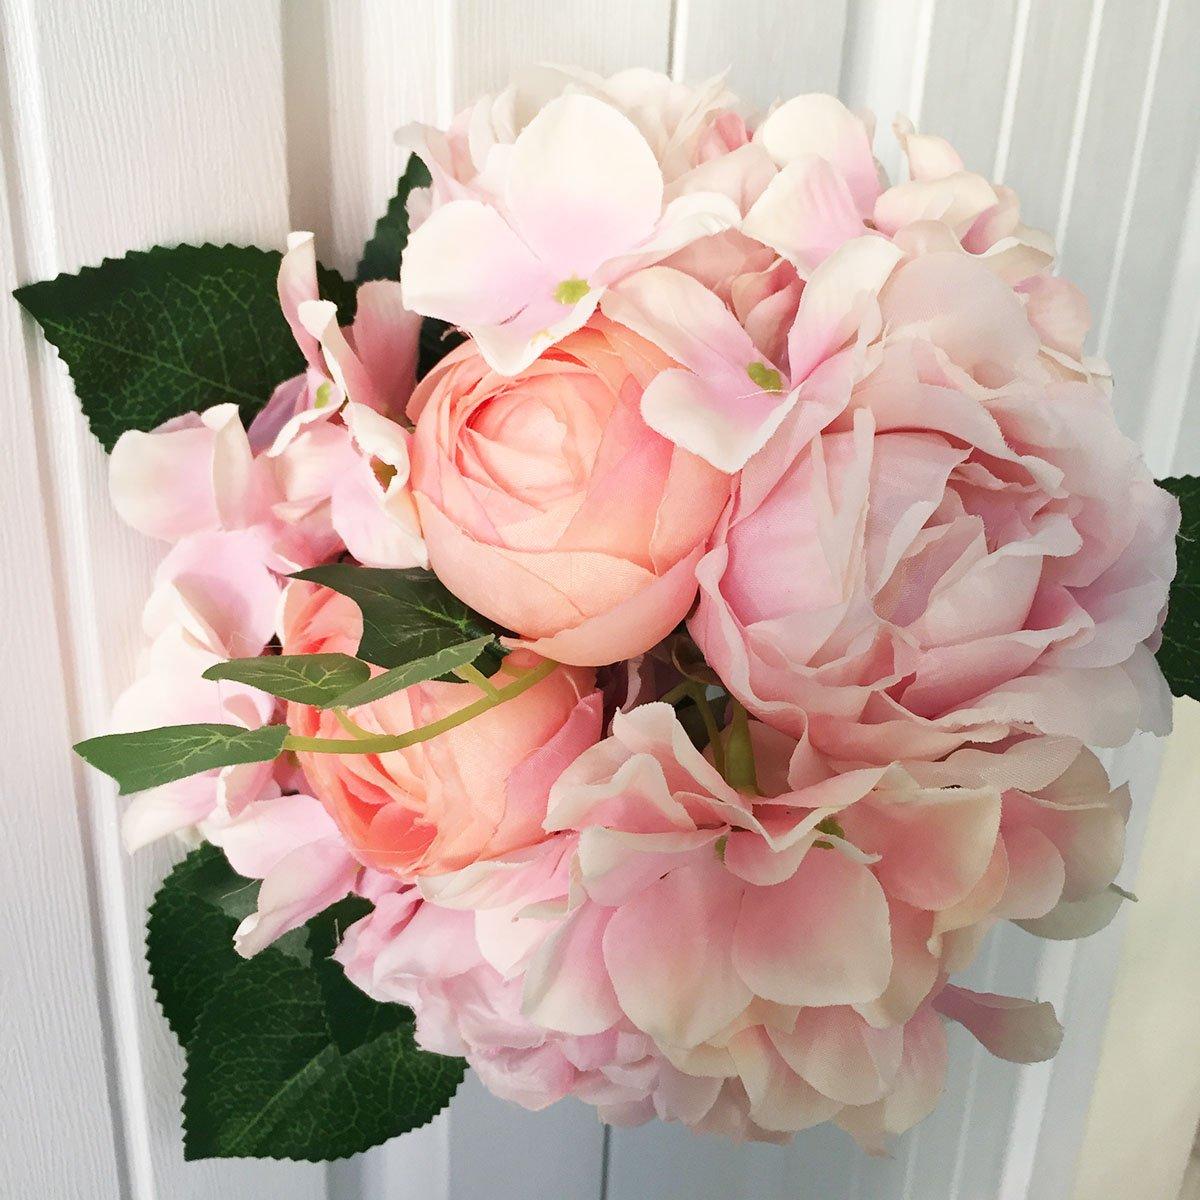 Artfen Artificial Flowers Fake Silk Hydrangea Flower Simulation Hand Tied Bouquet Lu Lotus Bouquet for Home Hotel Office Wedding Party Garden Craft Art Decor Approx 8.5 in Diameter Pink 2